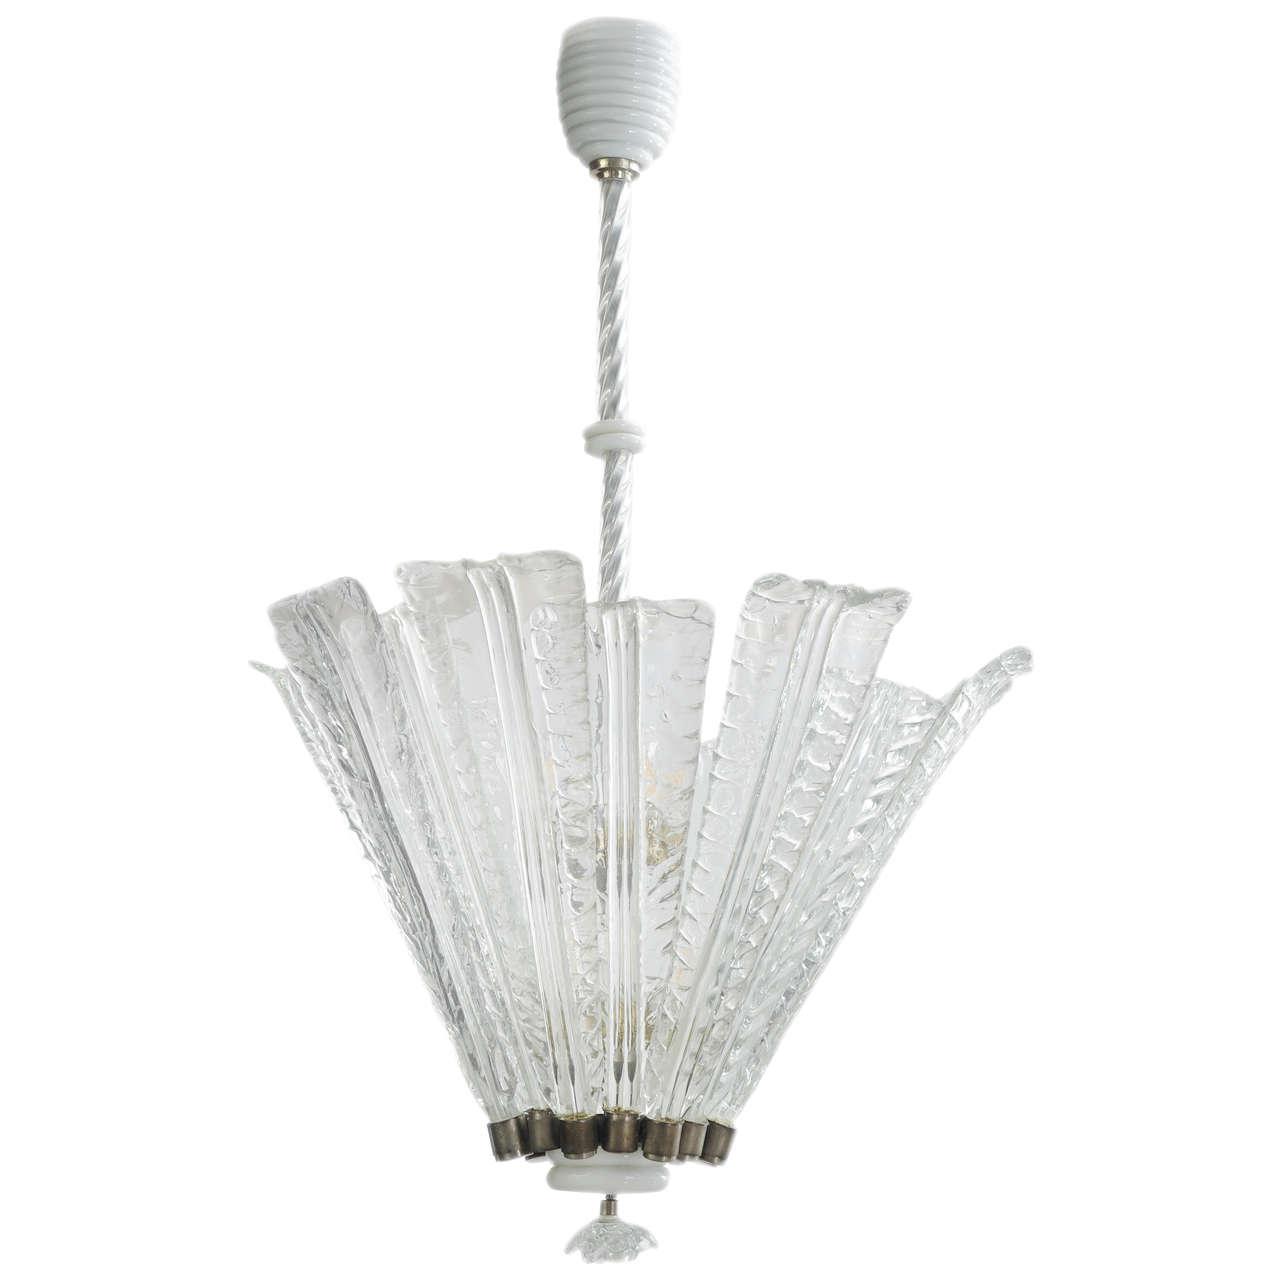 1930s venini chandelier in transparent and lattimo murano glass for 1930s venini chandelier in transparent and lattimo murano glass for sale arubaitofo Gallery